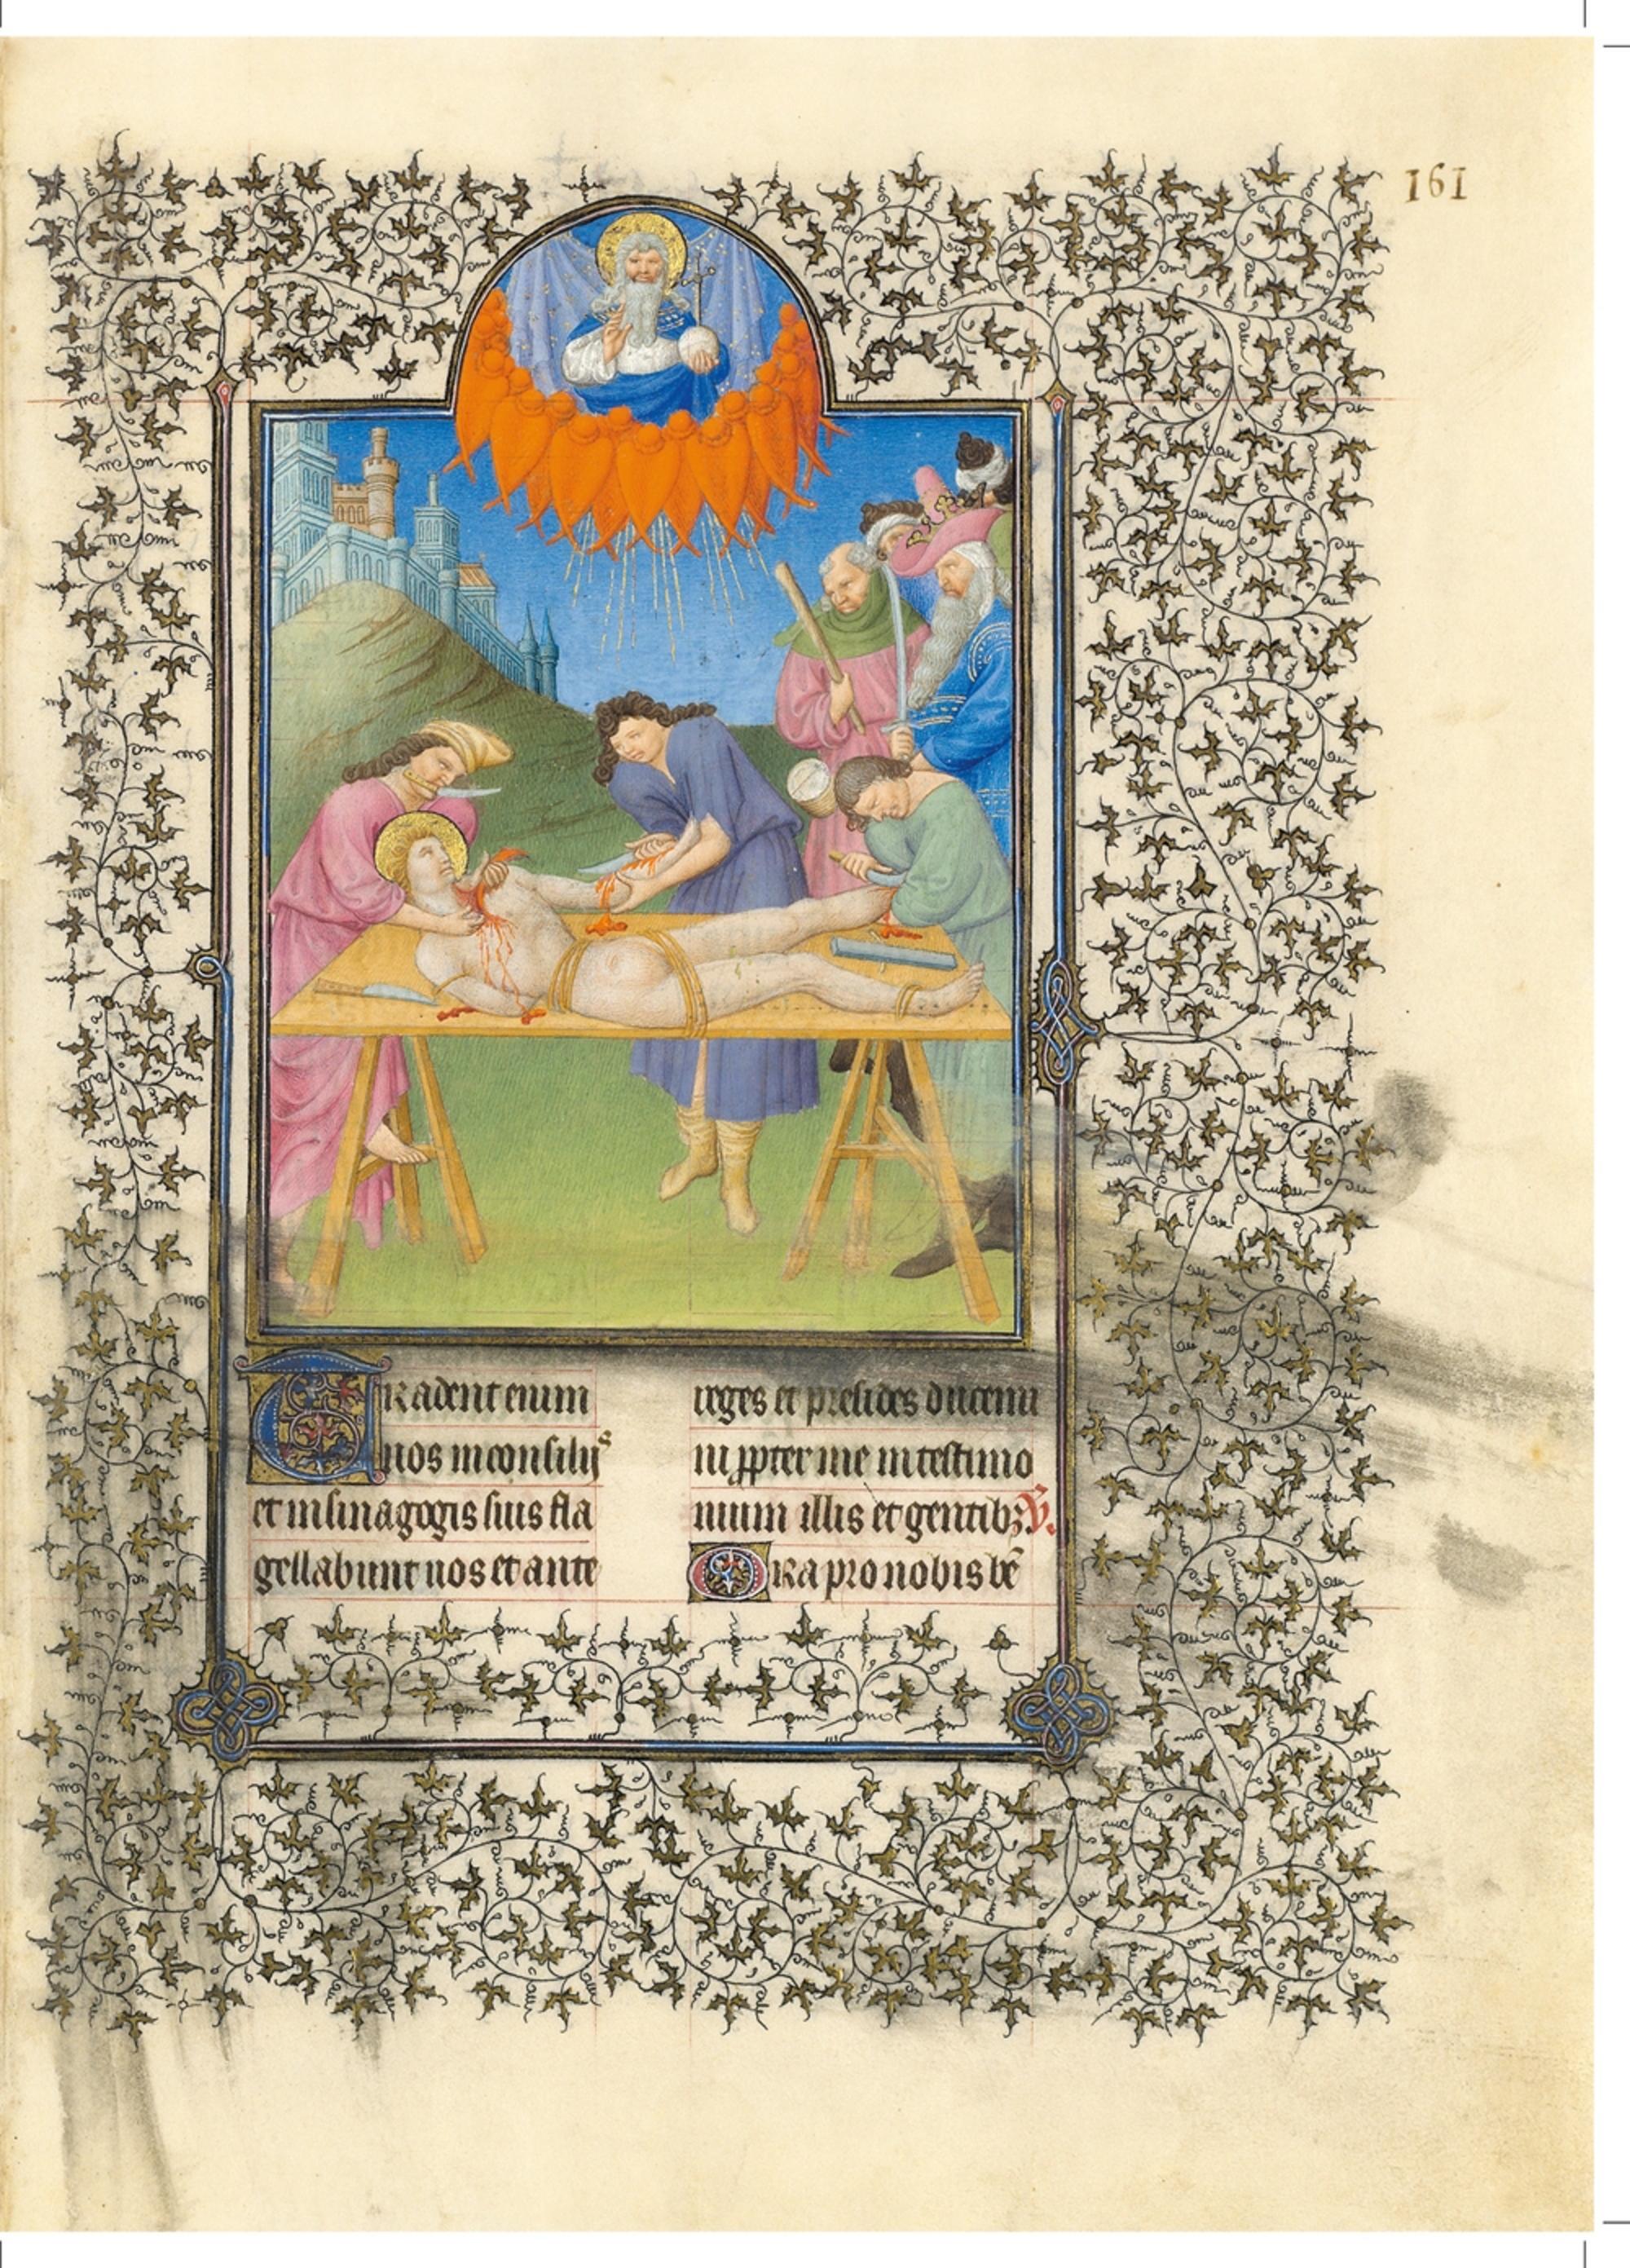 Limbourg Brothers 1409 Belles Heures Of Jean De France